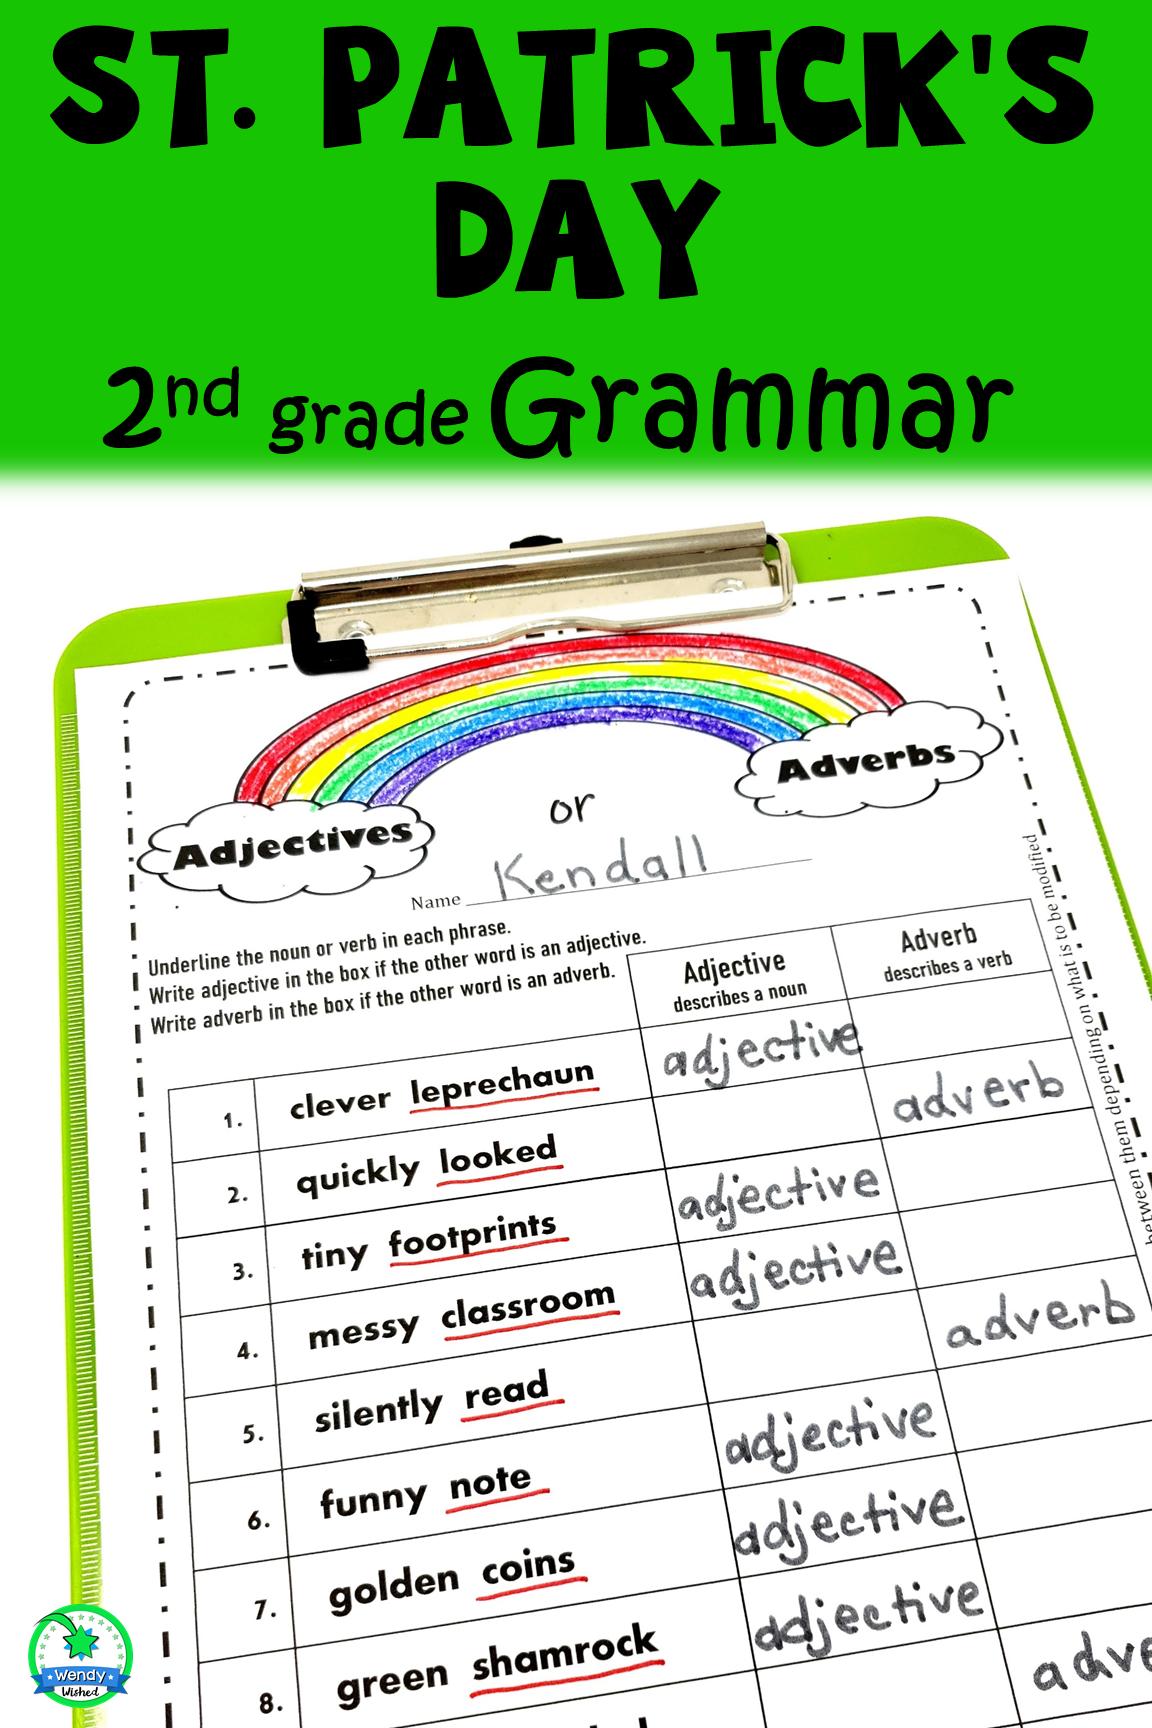 St Patrick S Day Grammar Worksheets For Second Grade Writing Lesson Plans Teacher Lesson Plans Grammar Worksheets [ 1728 x 1152 Pixel ]